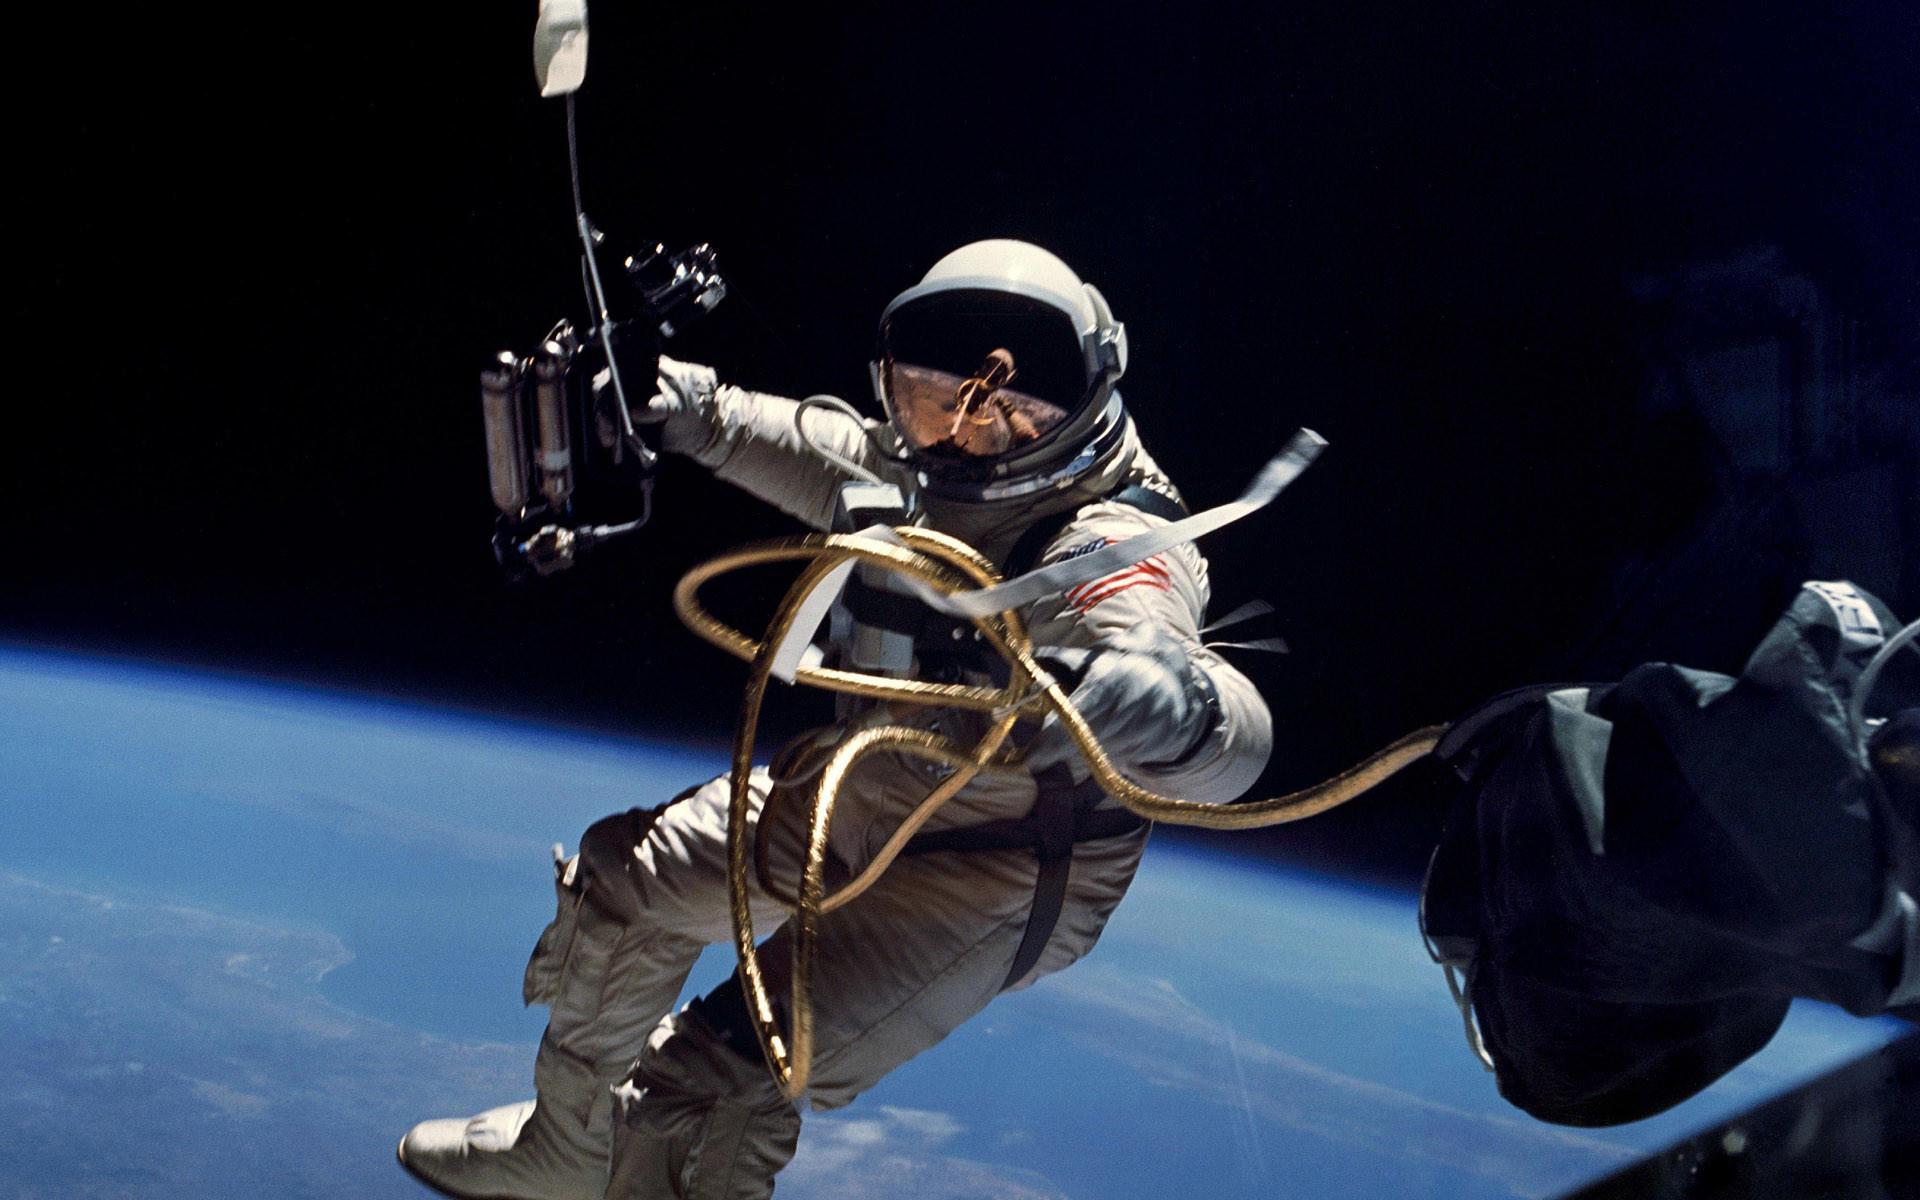 NASA Wallpaper Images   Download HD Wallpapers